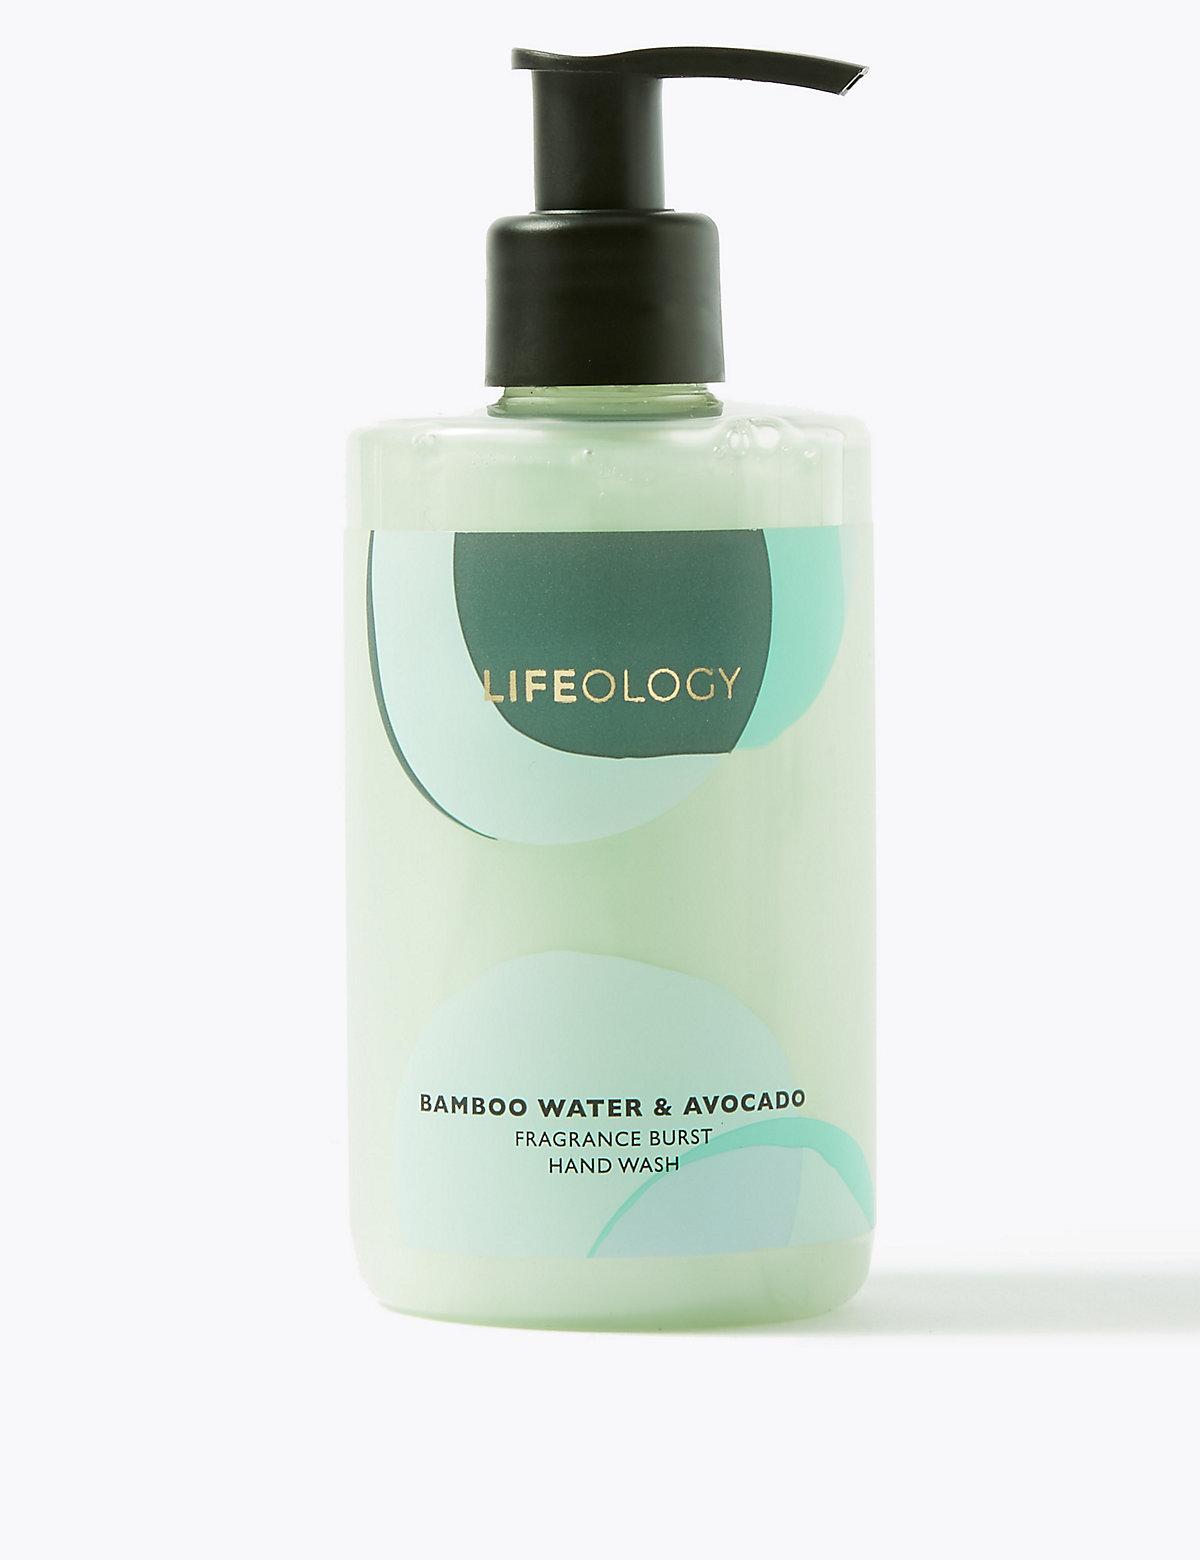 Lifeology Bamboo Water & Avocado Fragrance Burst Hand Wash 250ml